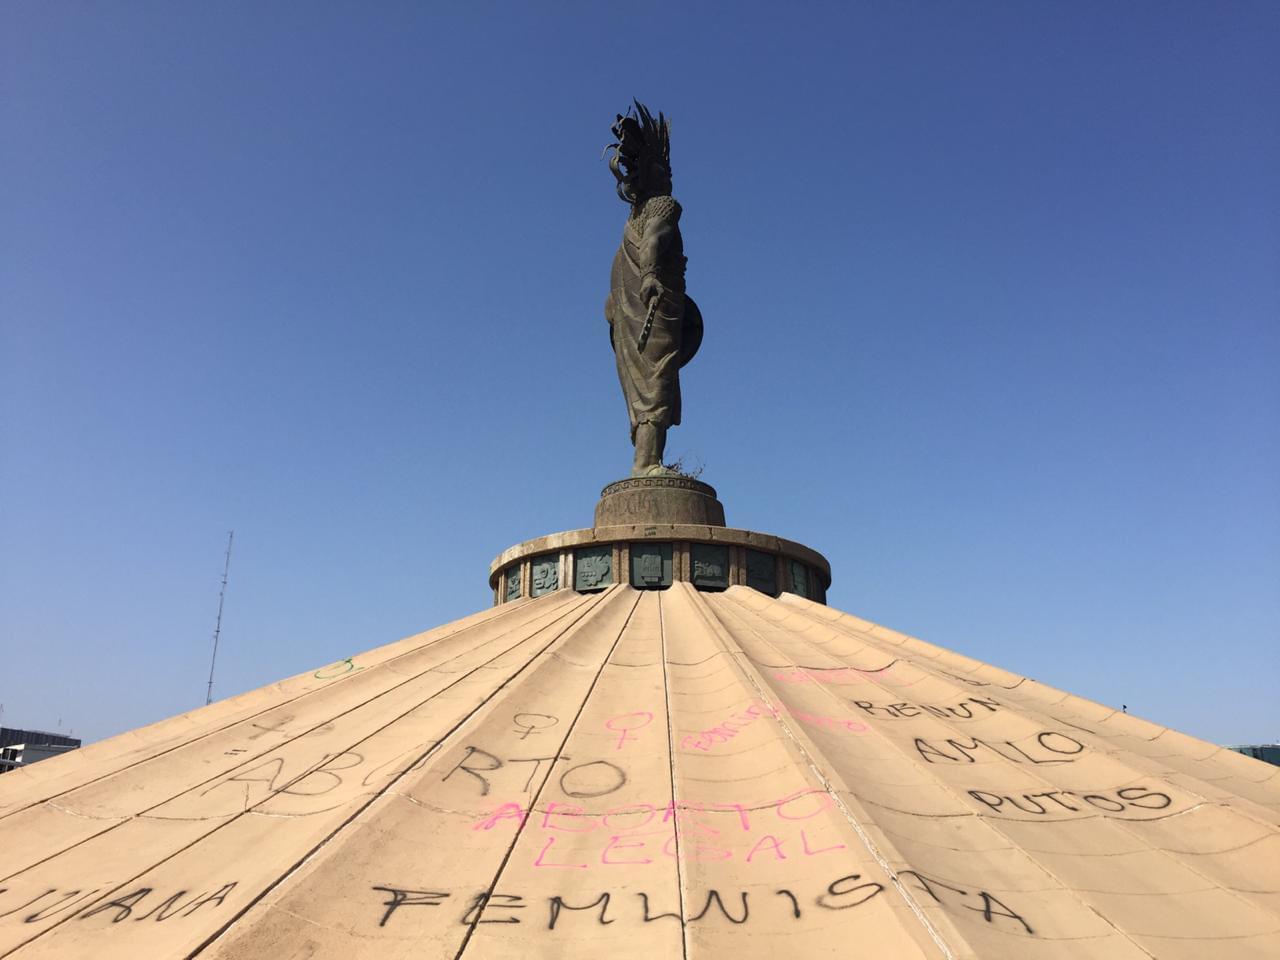 feminicidios, tijuana, glorieta, protestas, aborto